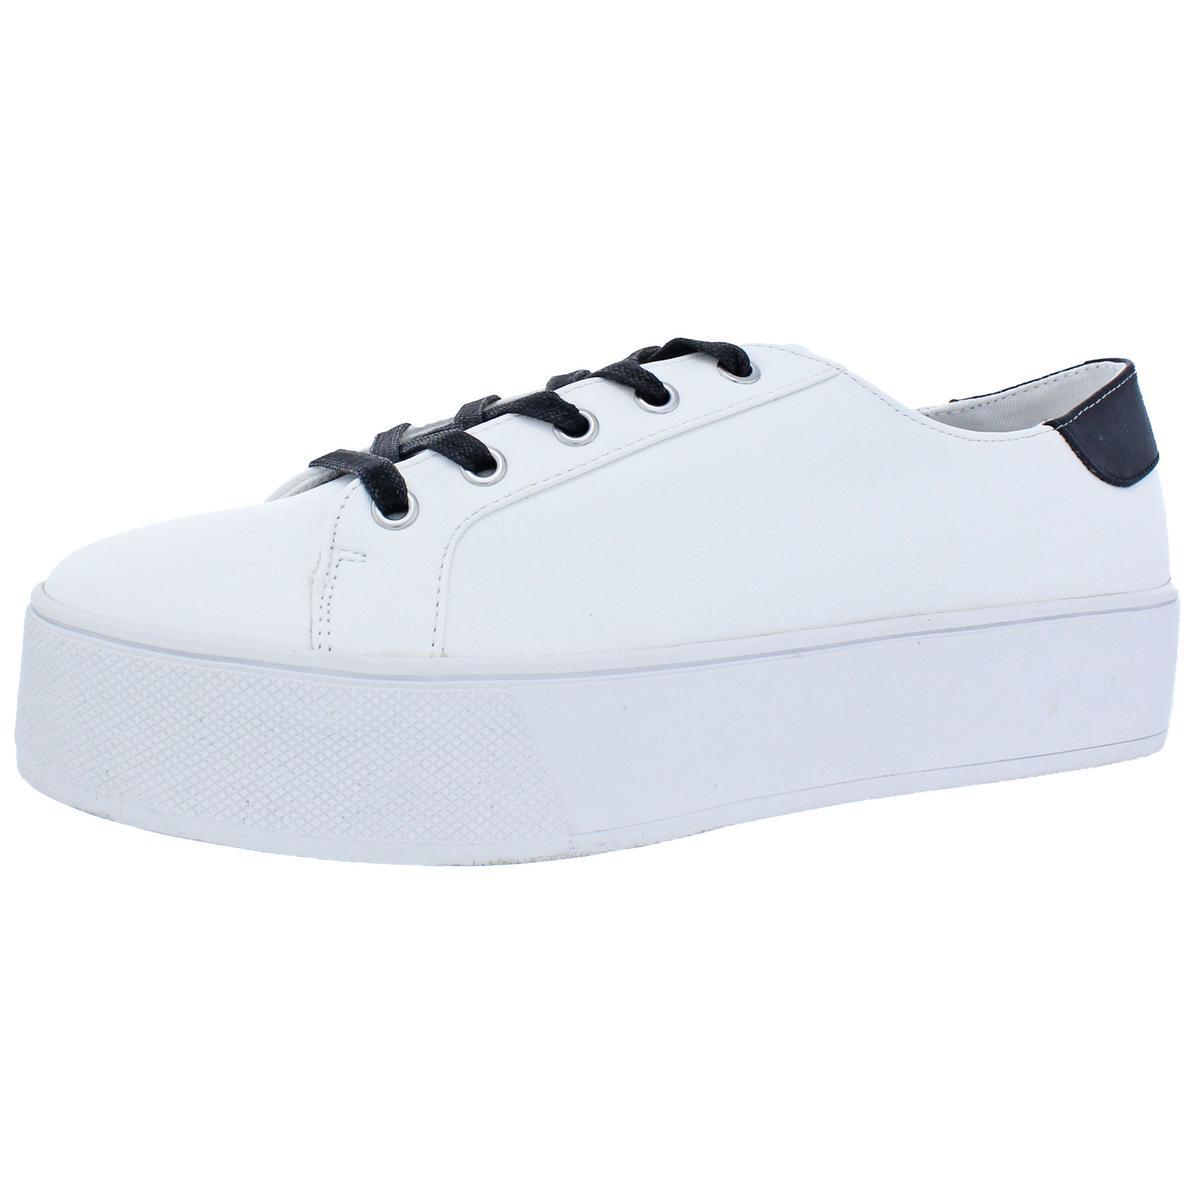 Steve Madden Damenschuhe Felecia Felecia Damenschuhe Weiß Fashion Sneakers 11 Medium (B,M ... 7fbb9c